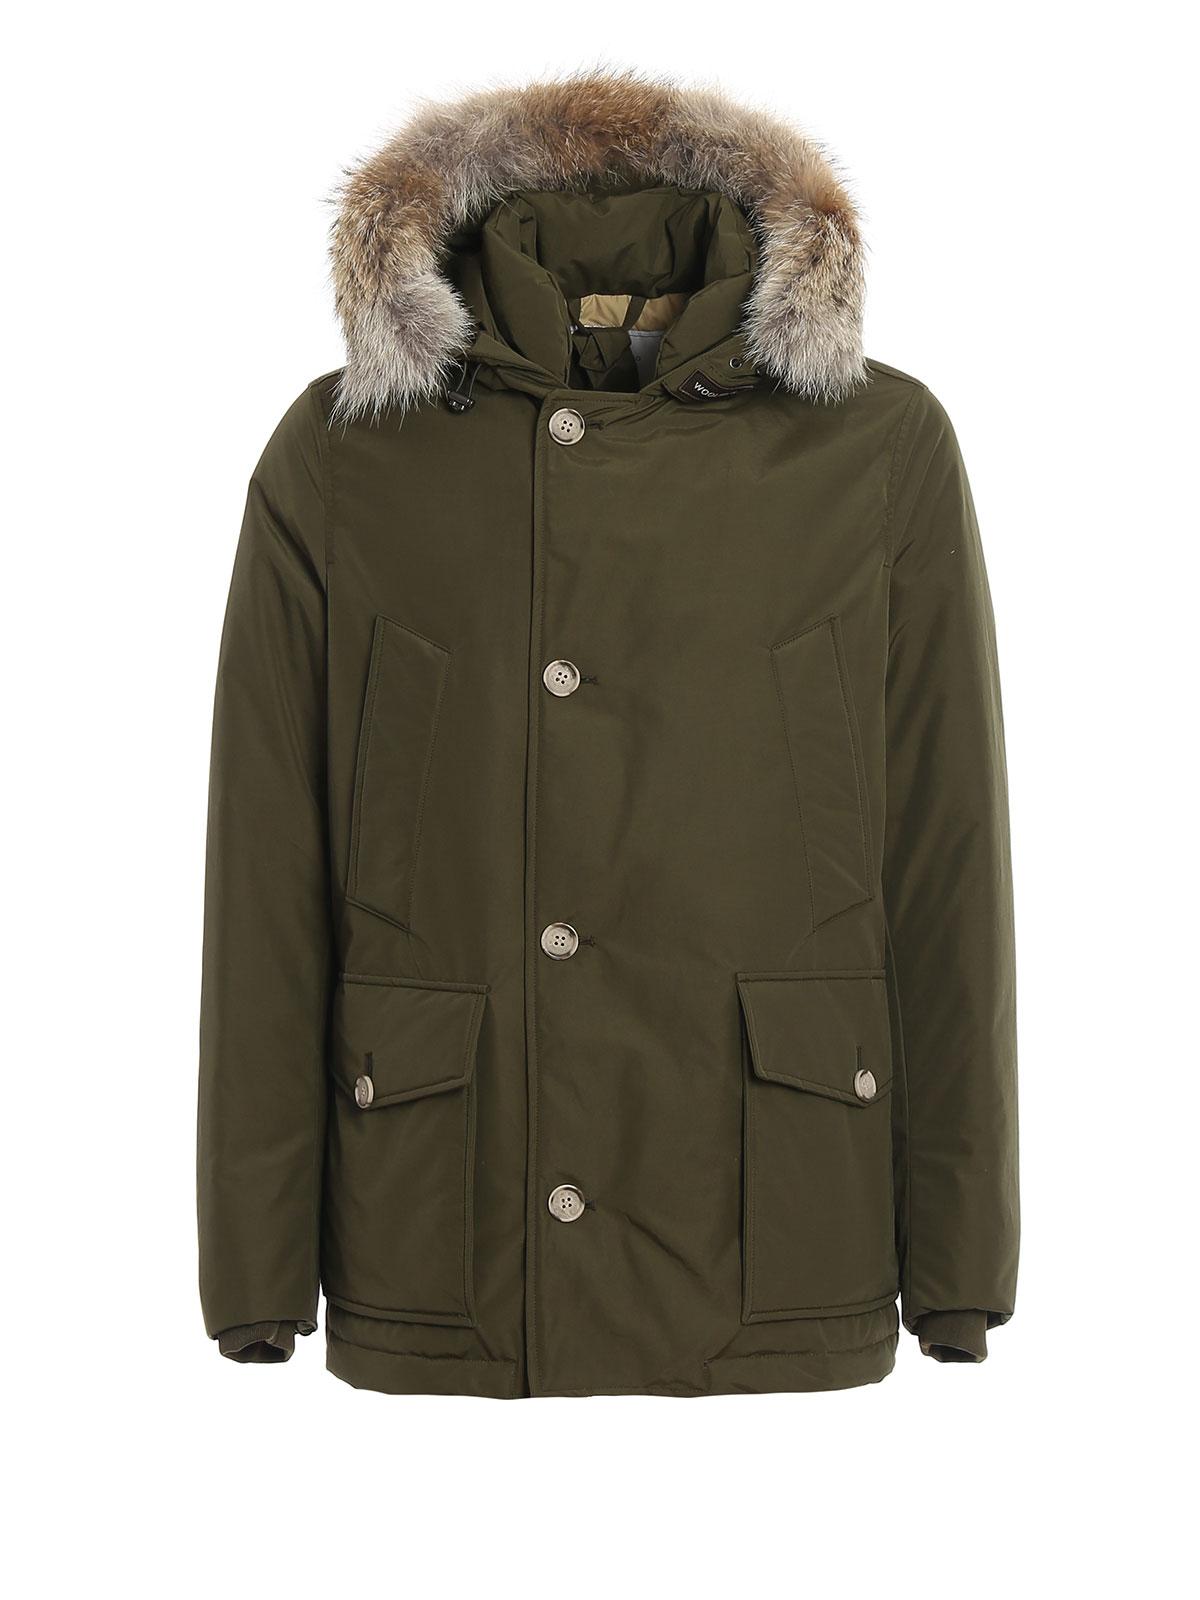 Woolrich WS Artic Anorak Verde Militare